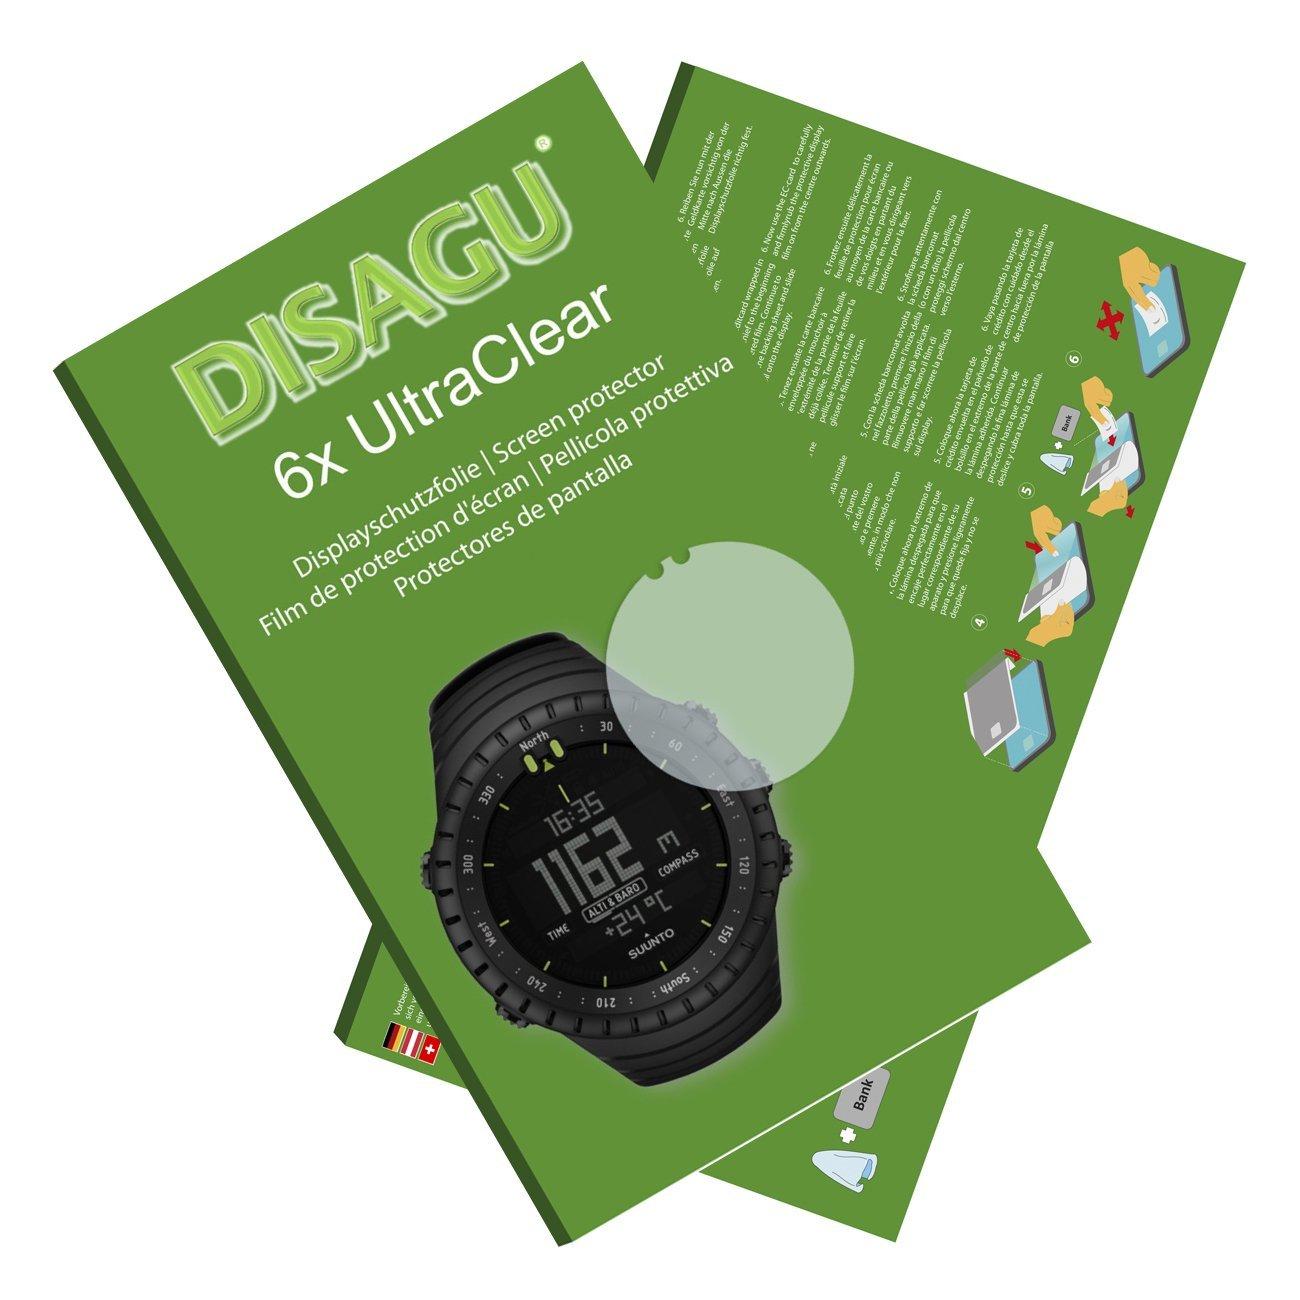 DISAGU 6x Ultra Clear Screen Protector for Suunto Core All Black